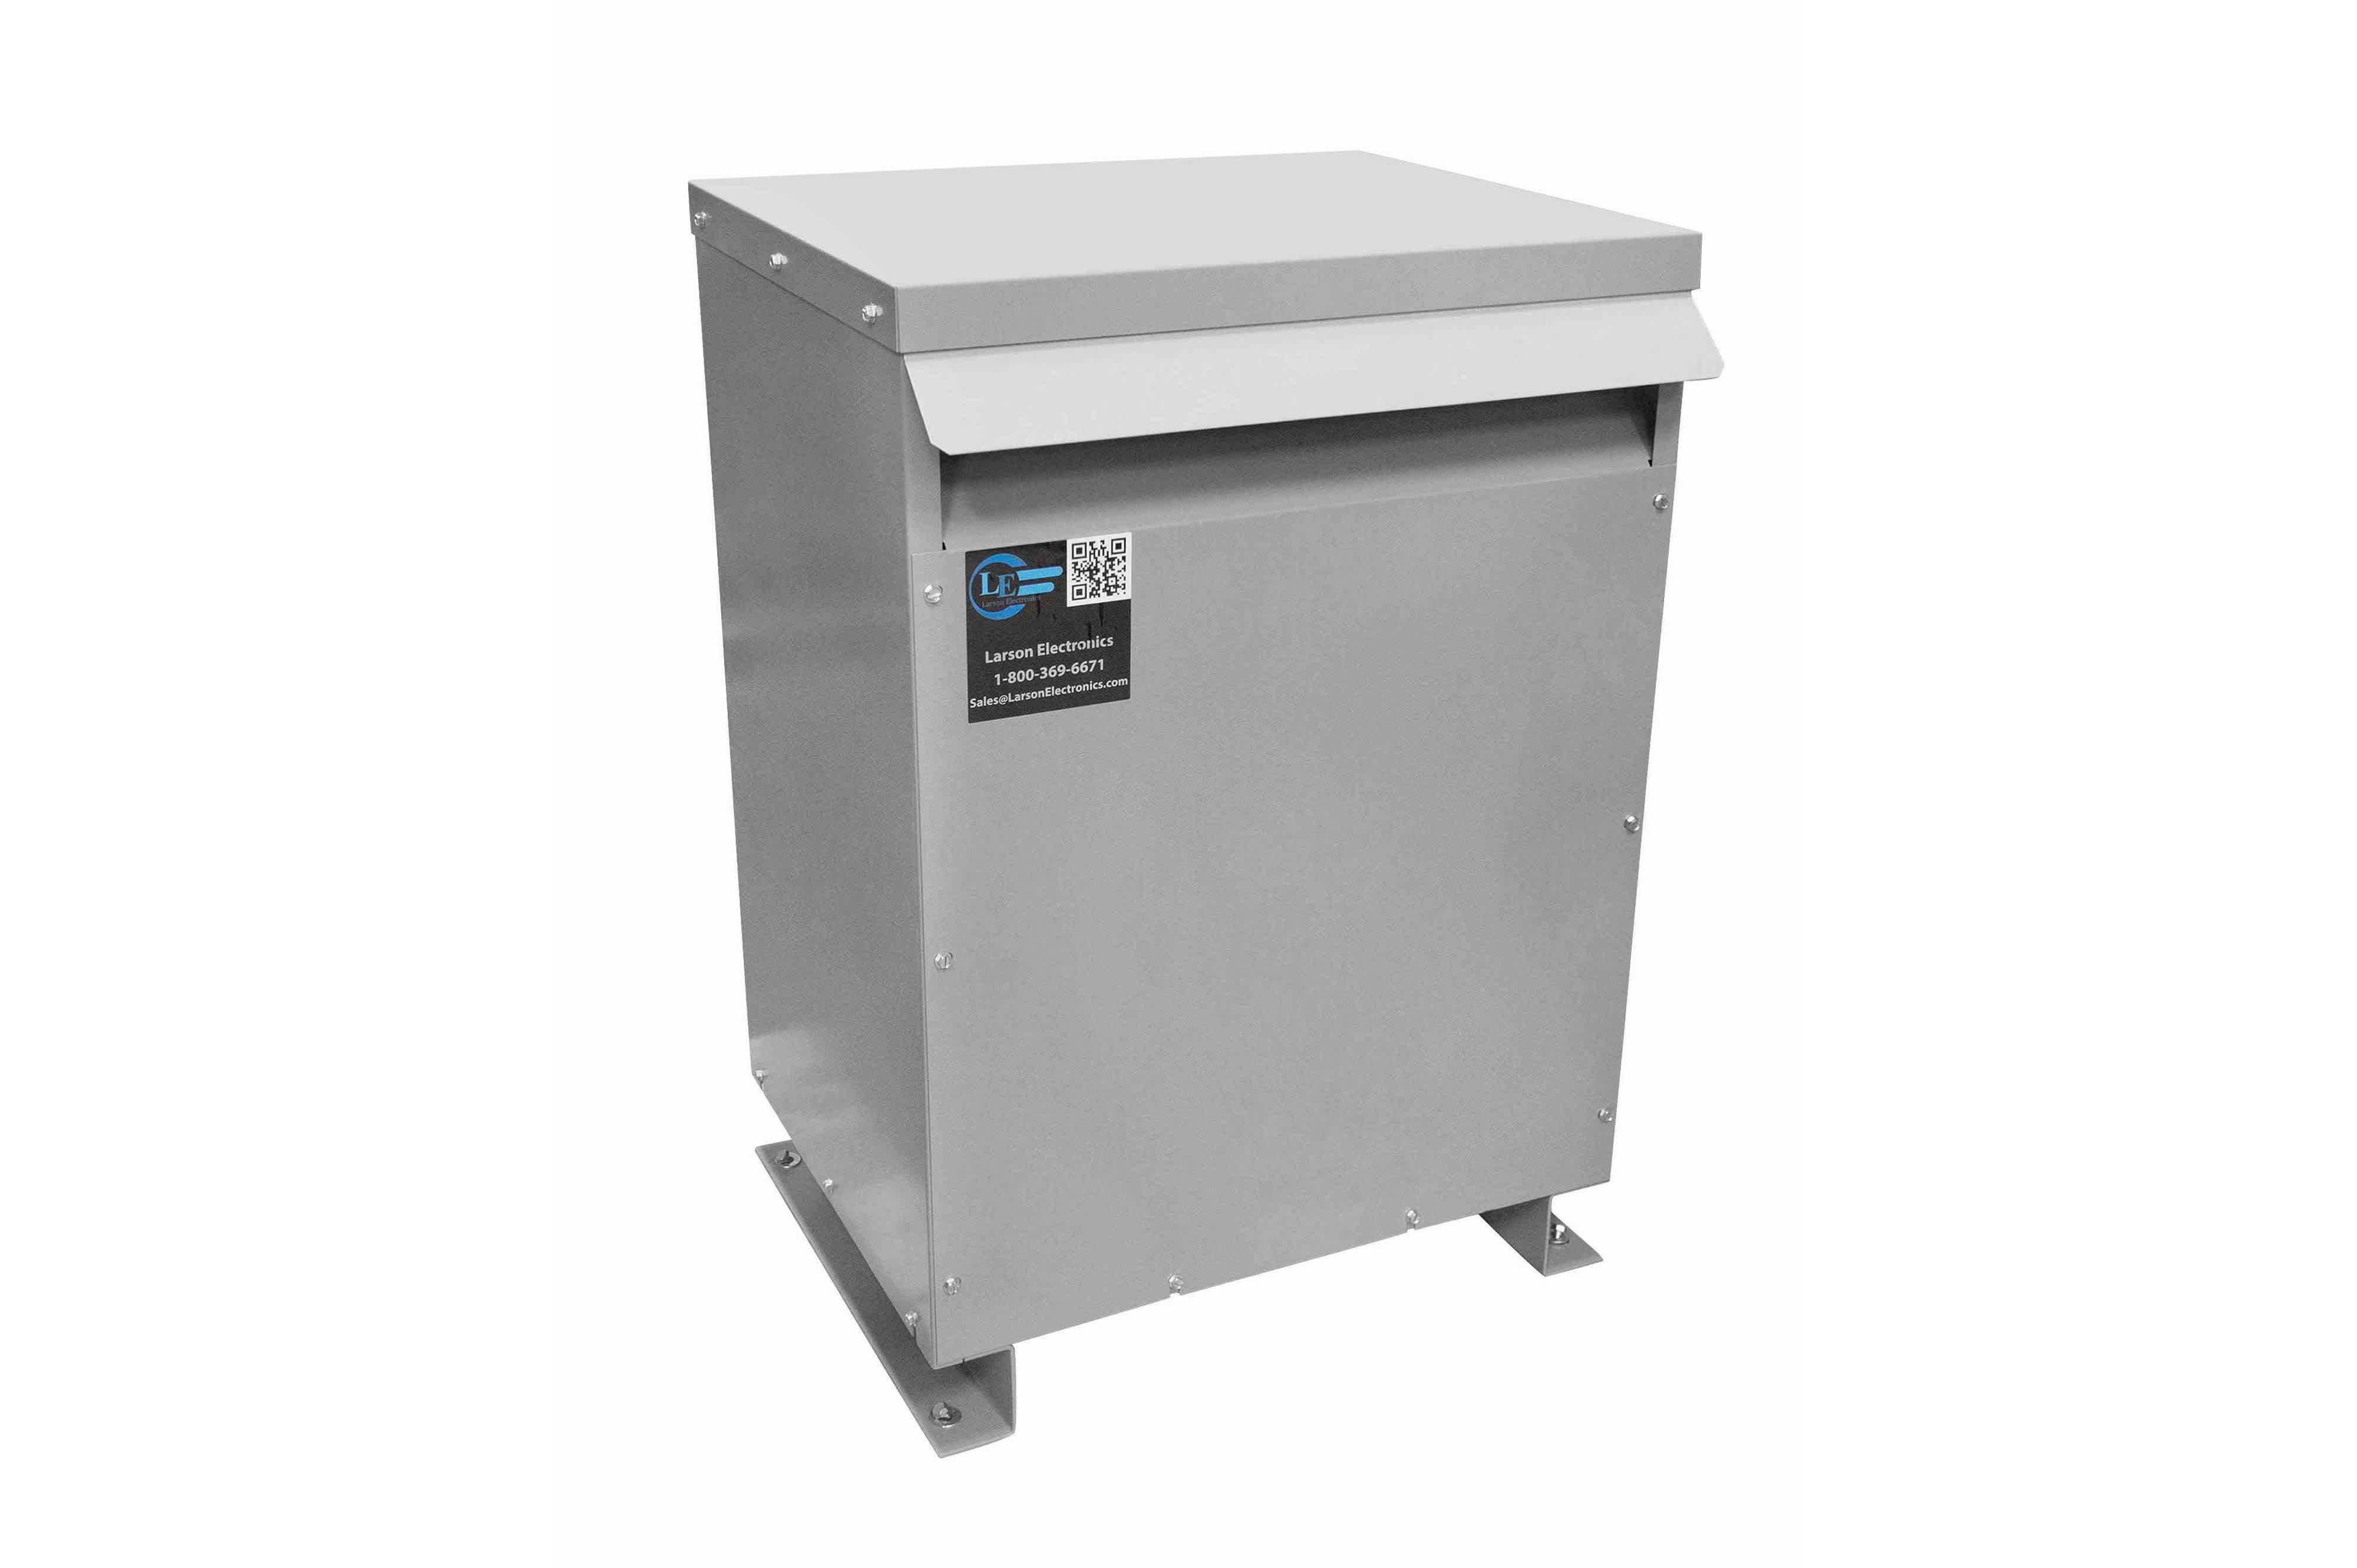 14 kVA 3PH Isolation Transformer, 240V Wye Primary, 480V Delta Secondary, N3R, Ventilated, 60 Hz